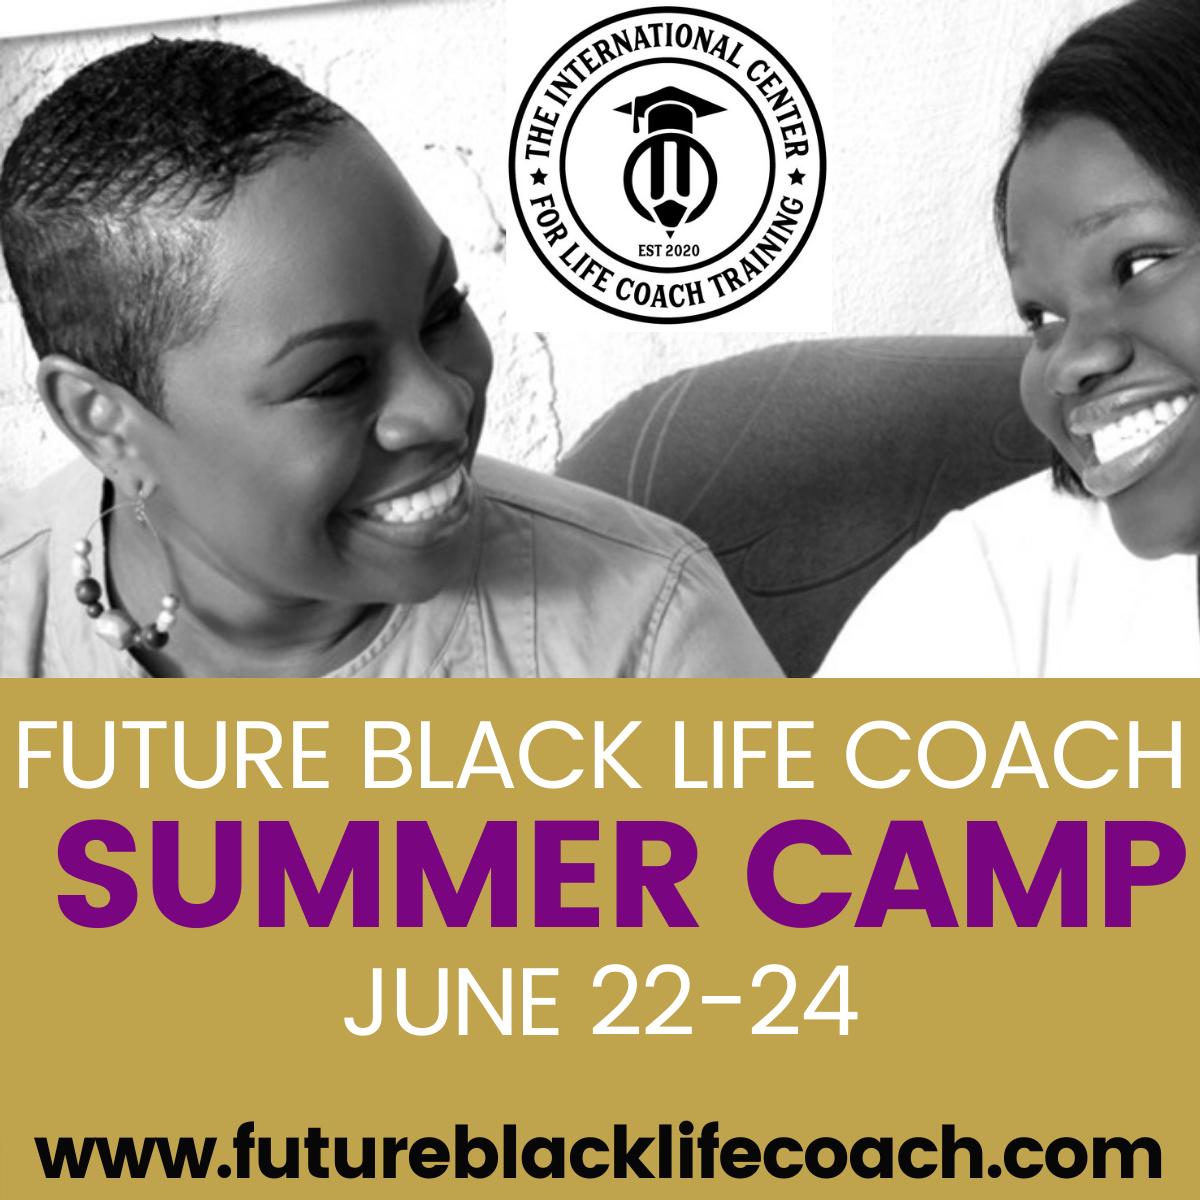 Future Black Life Coach SUMMER CAMP